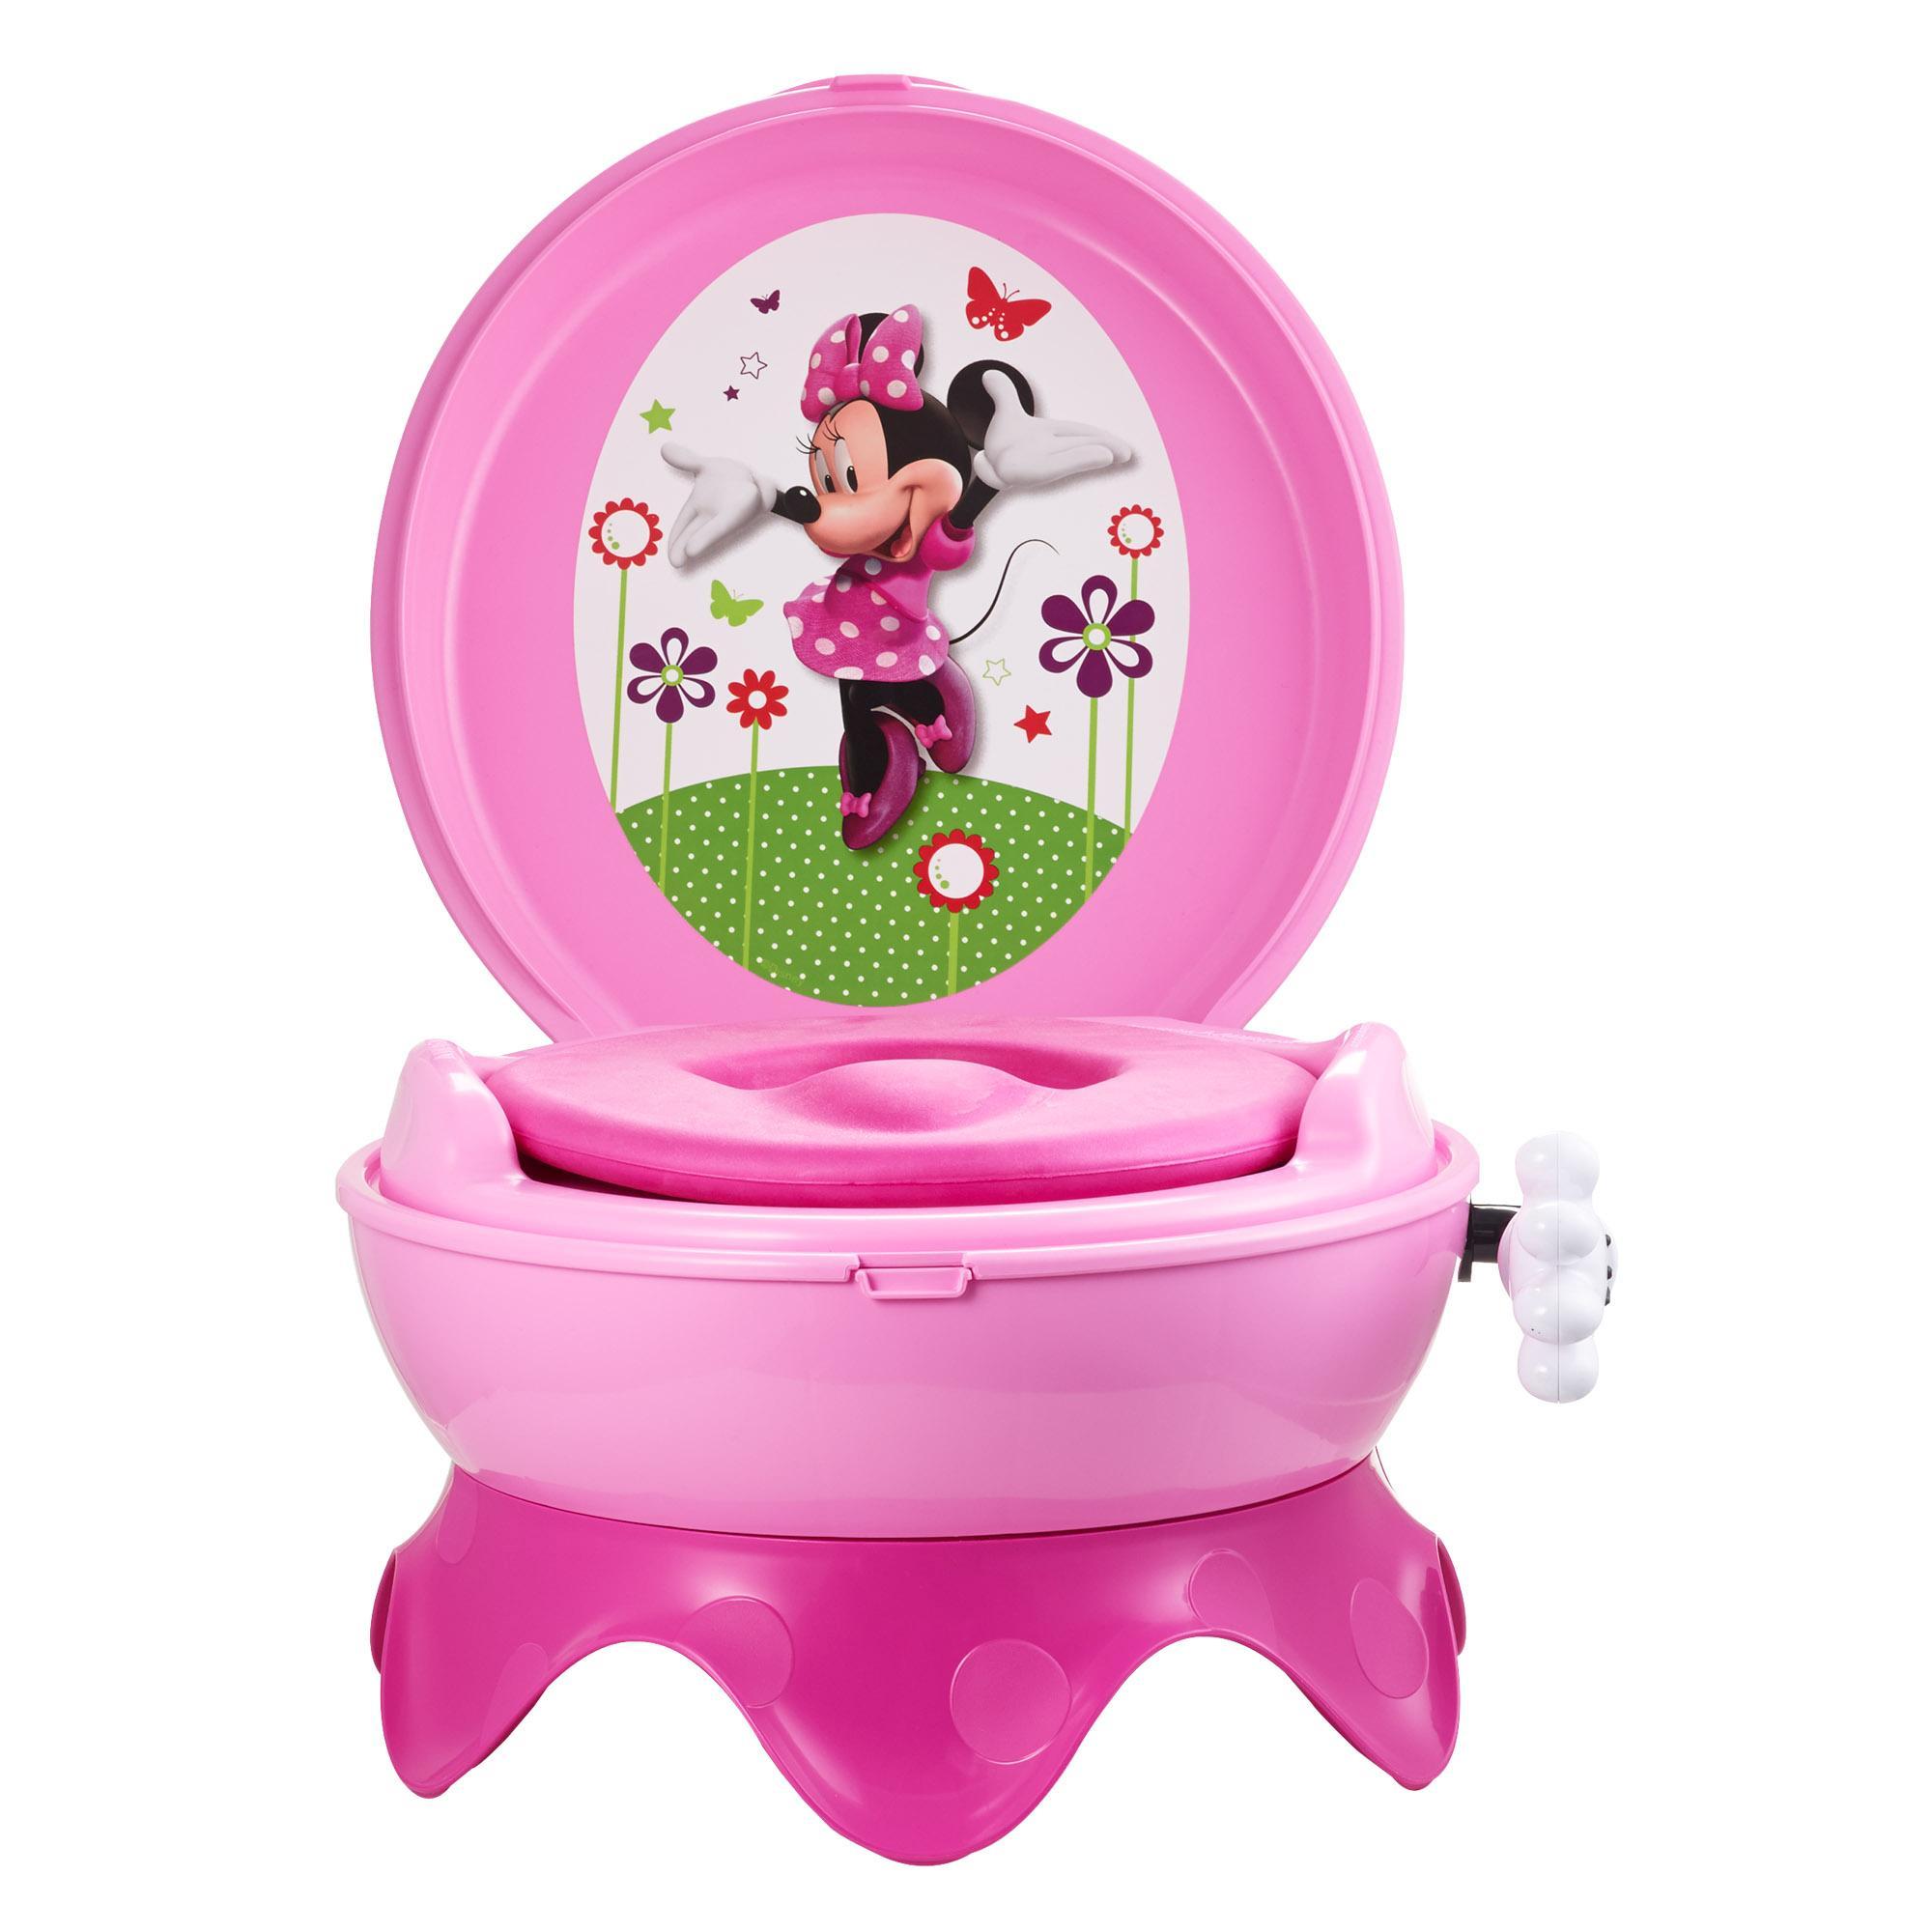 Minnie Mouse Potty Car Interior Design